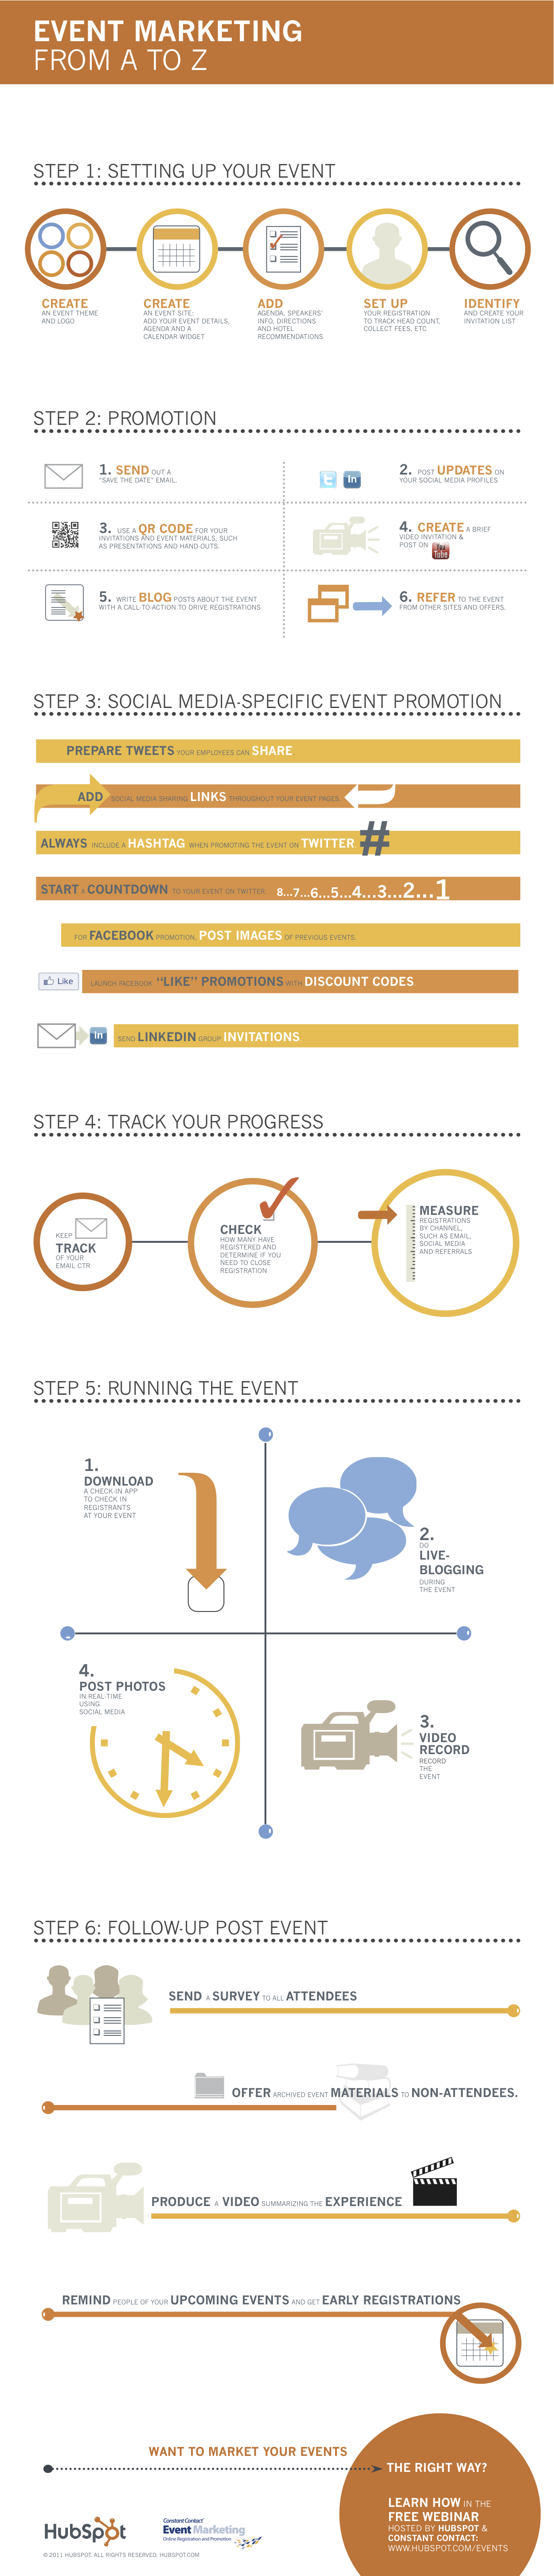 Event Planning Checklist  Event Planning Tips  Tricks